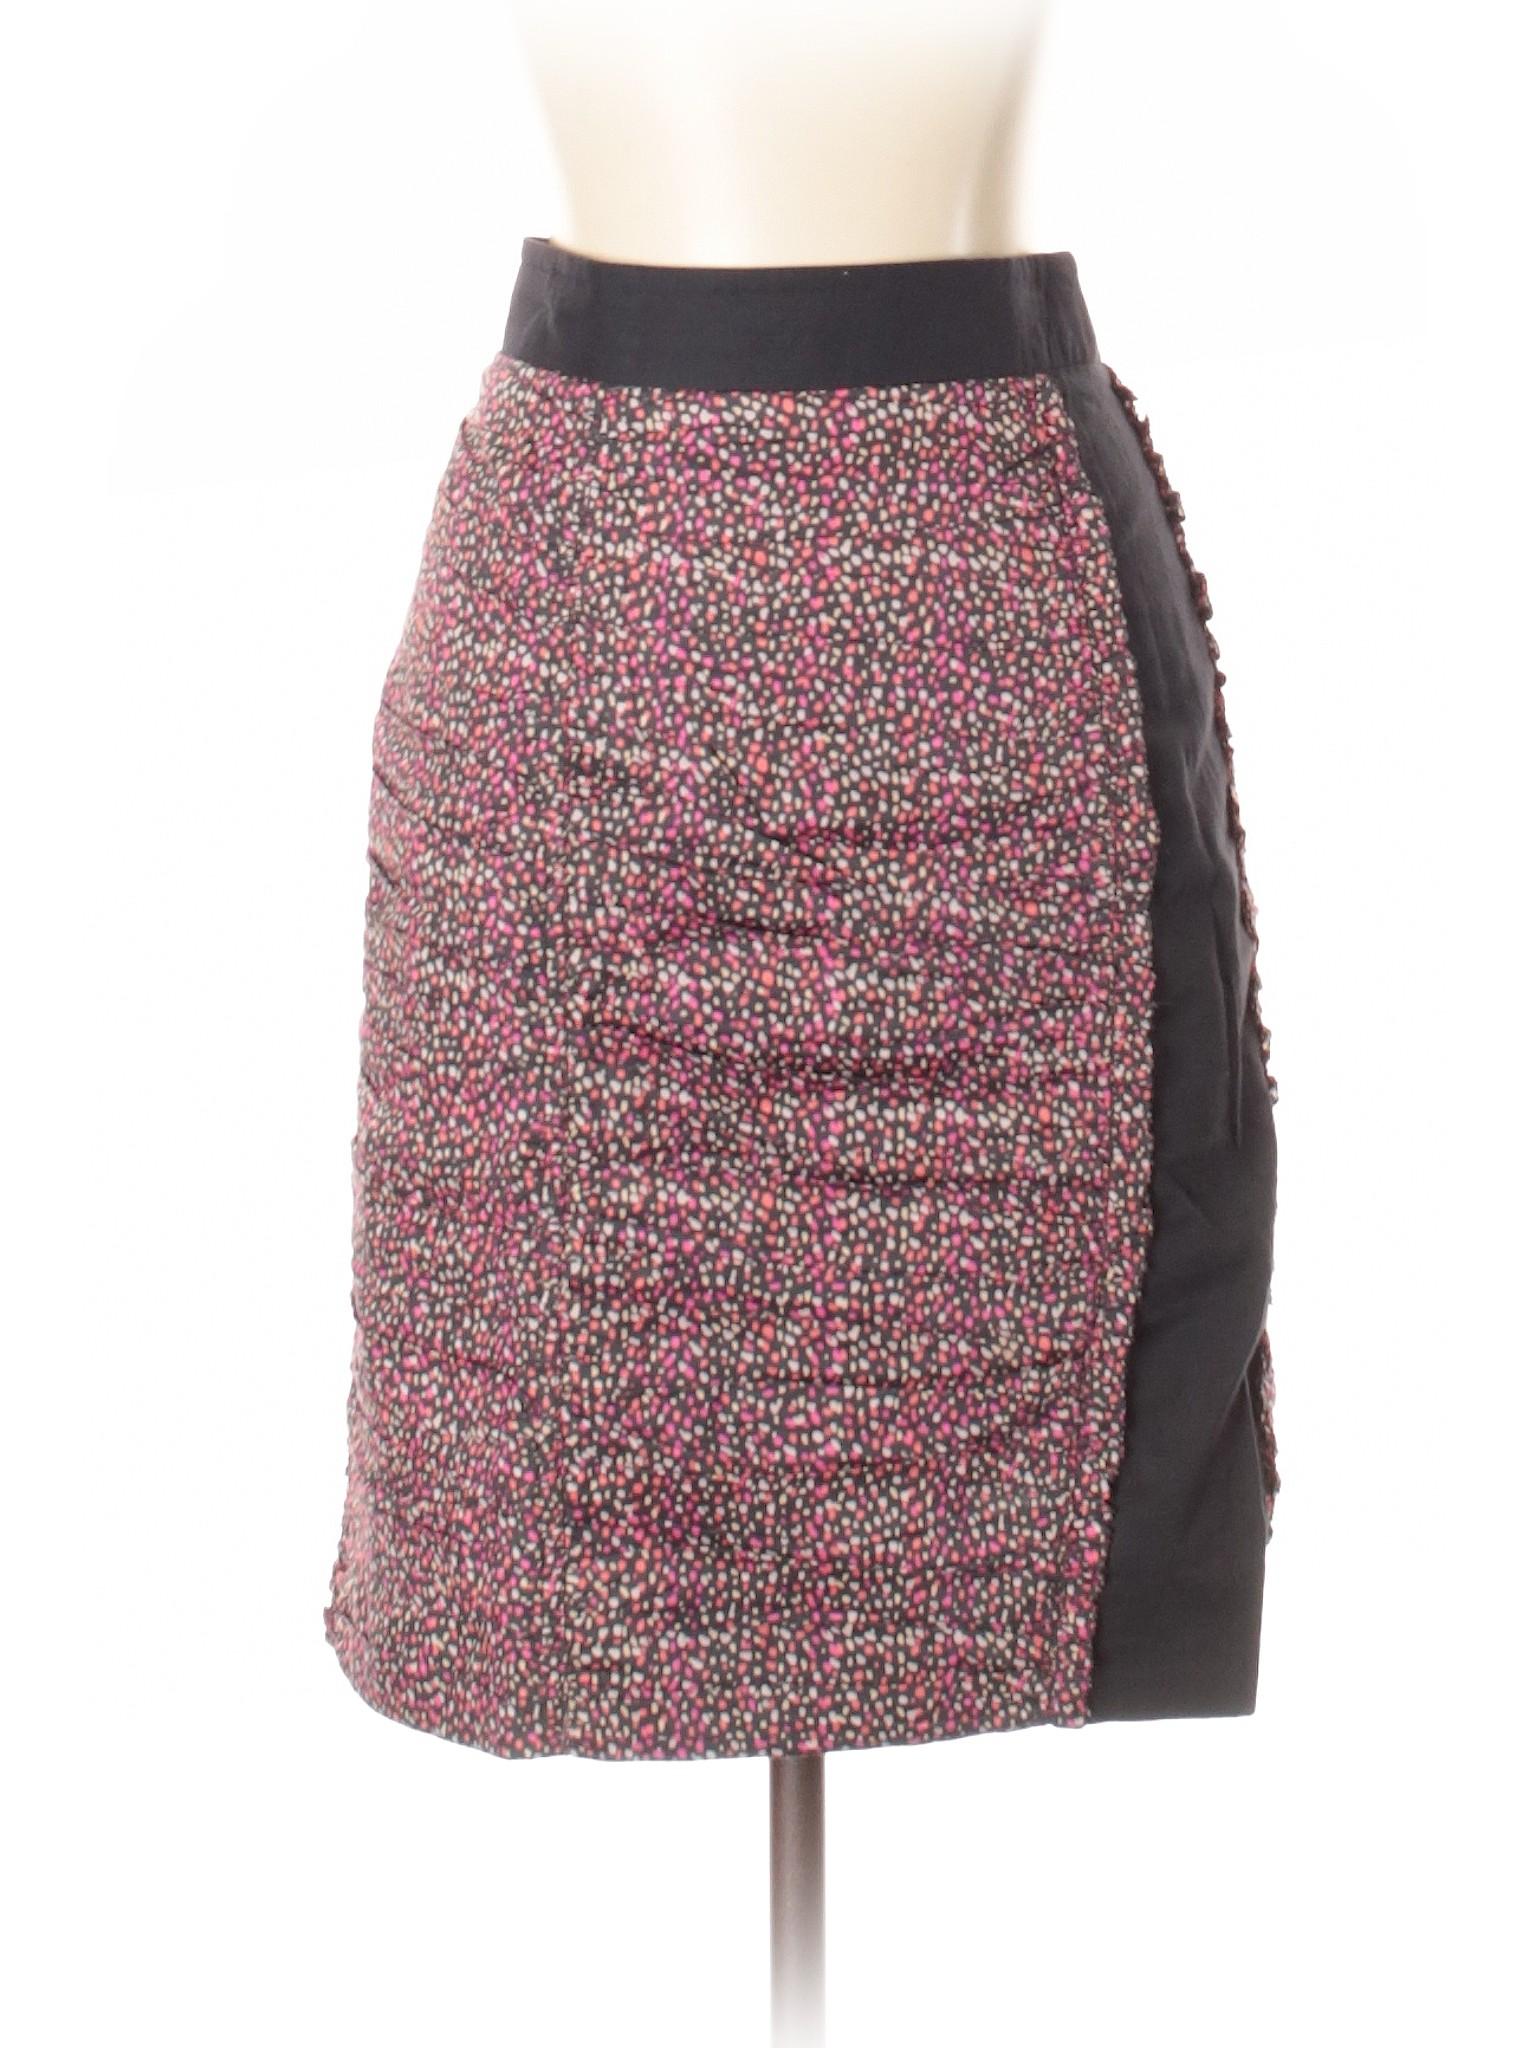 Casual Boutique Boutique Casual Boutique Casual Skirt Casual Skirt Boutique Skirt Casual Casual Skirt Boutique Skirt Boutique naYAqAgX8